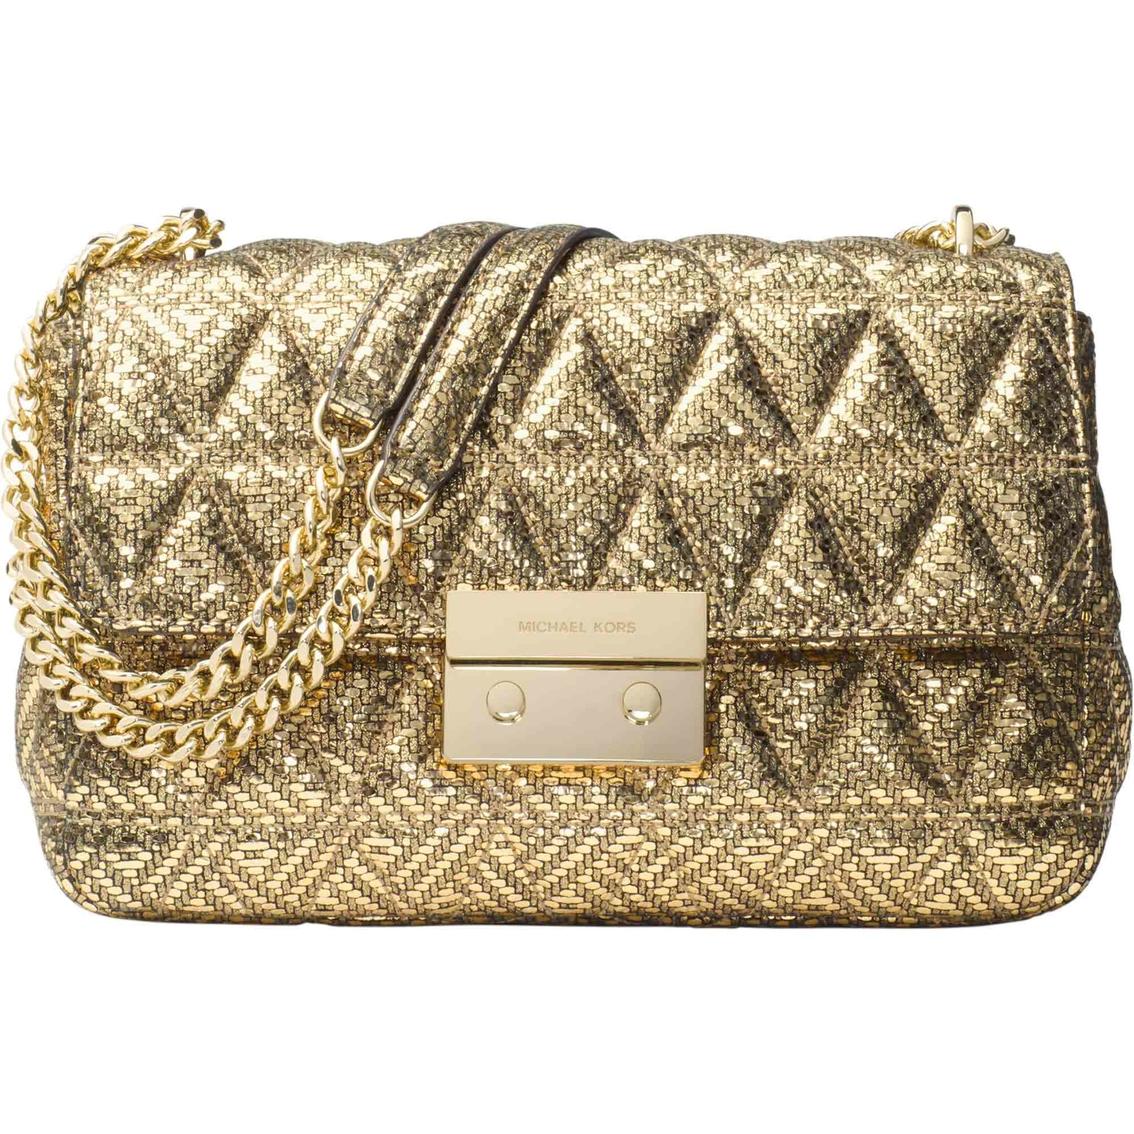 62eedd88425b Michael Kors Sloan Large Chain Shoulder Bag